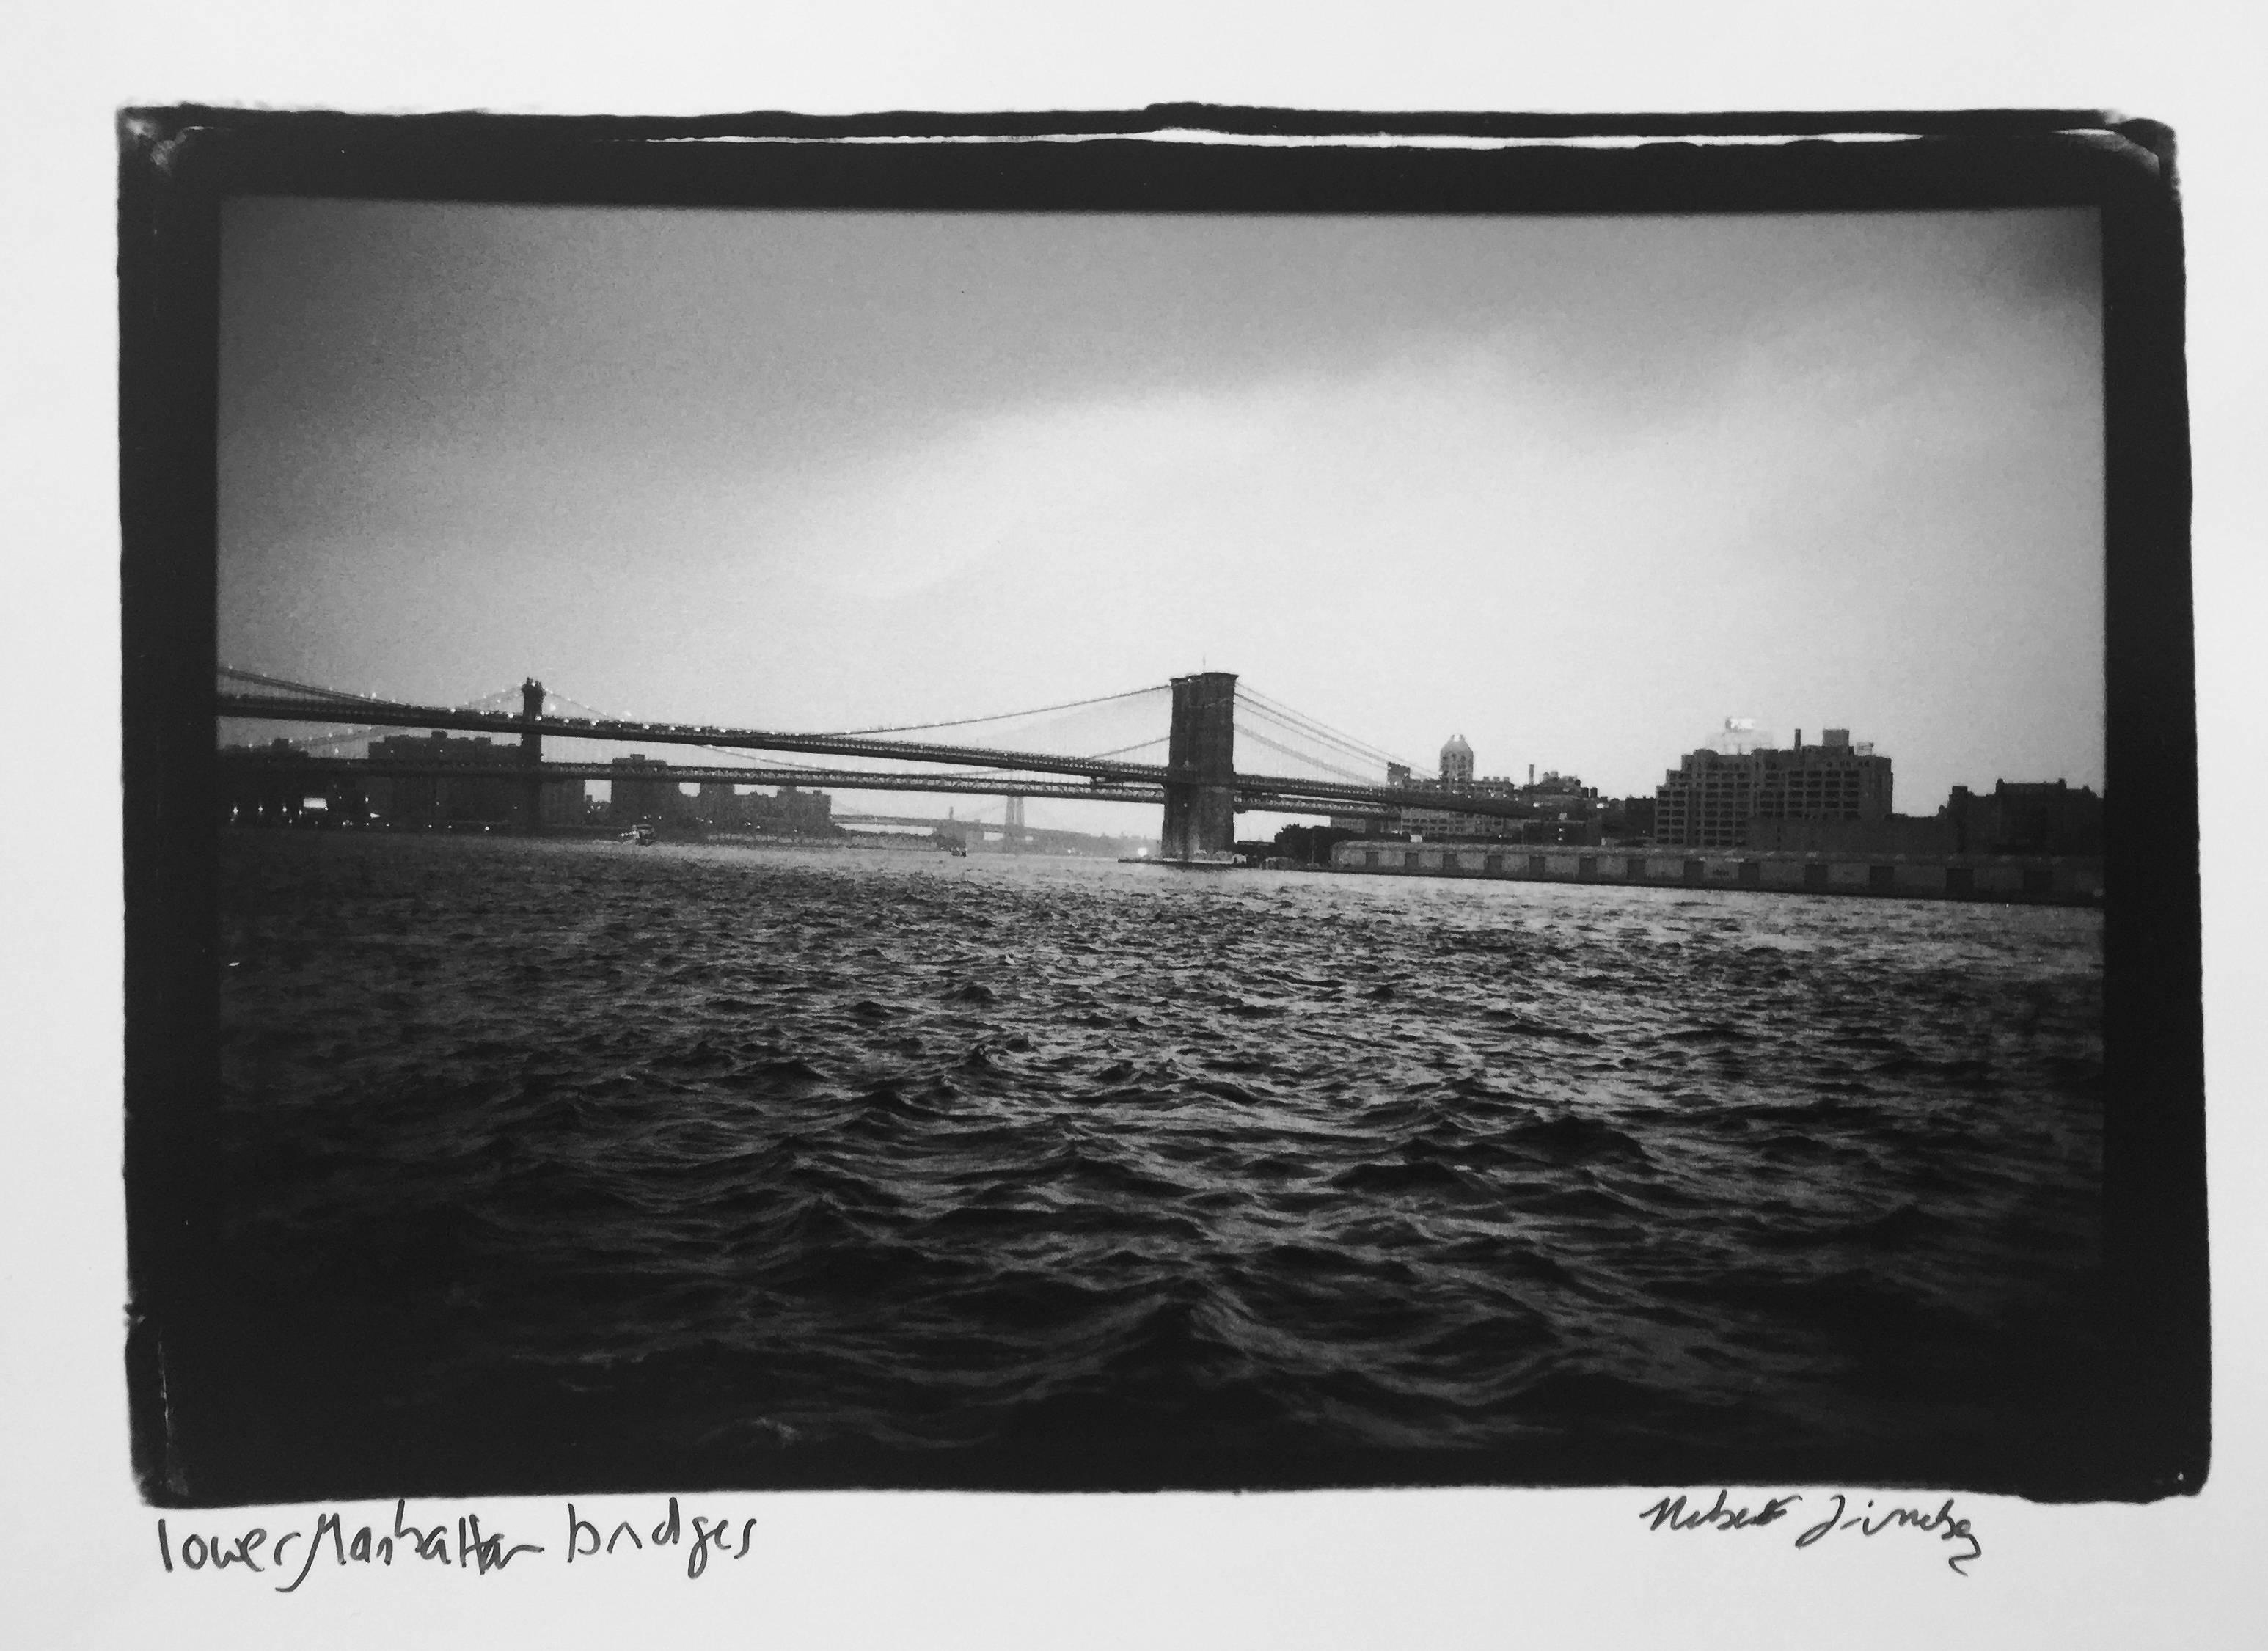 Lower Manhattan Bridges, New York City, Waterfront Photograph Gelatin Silver